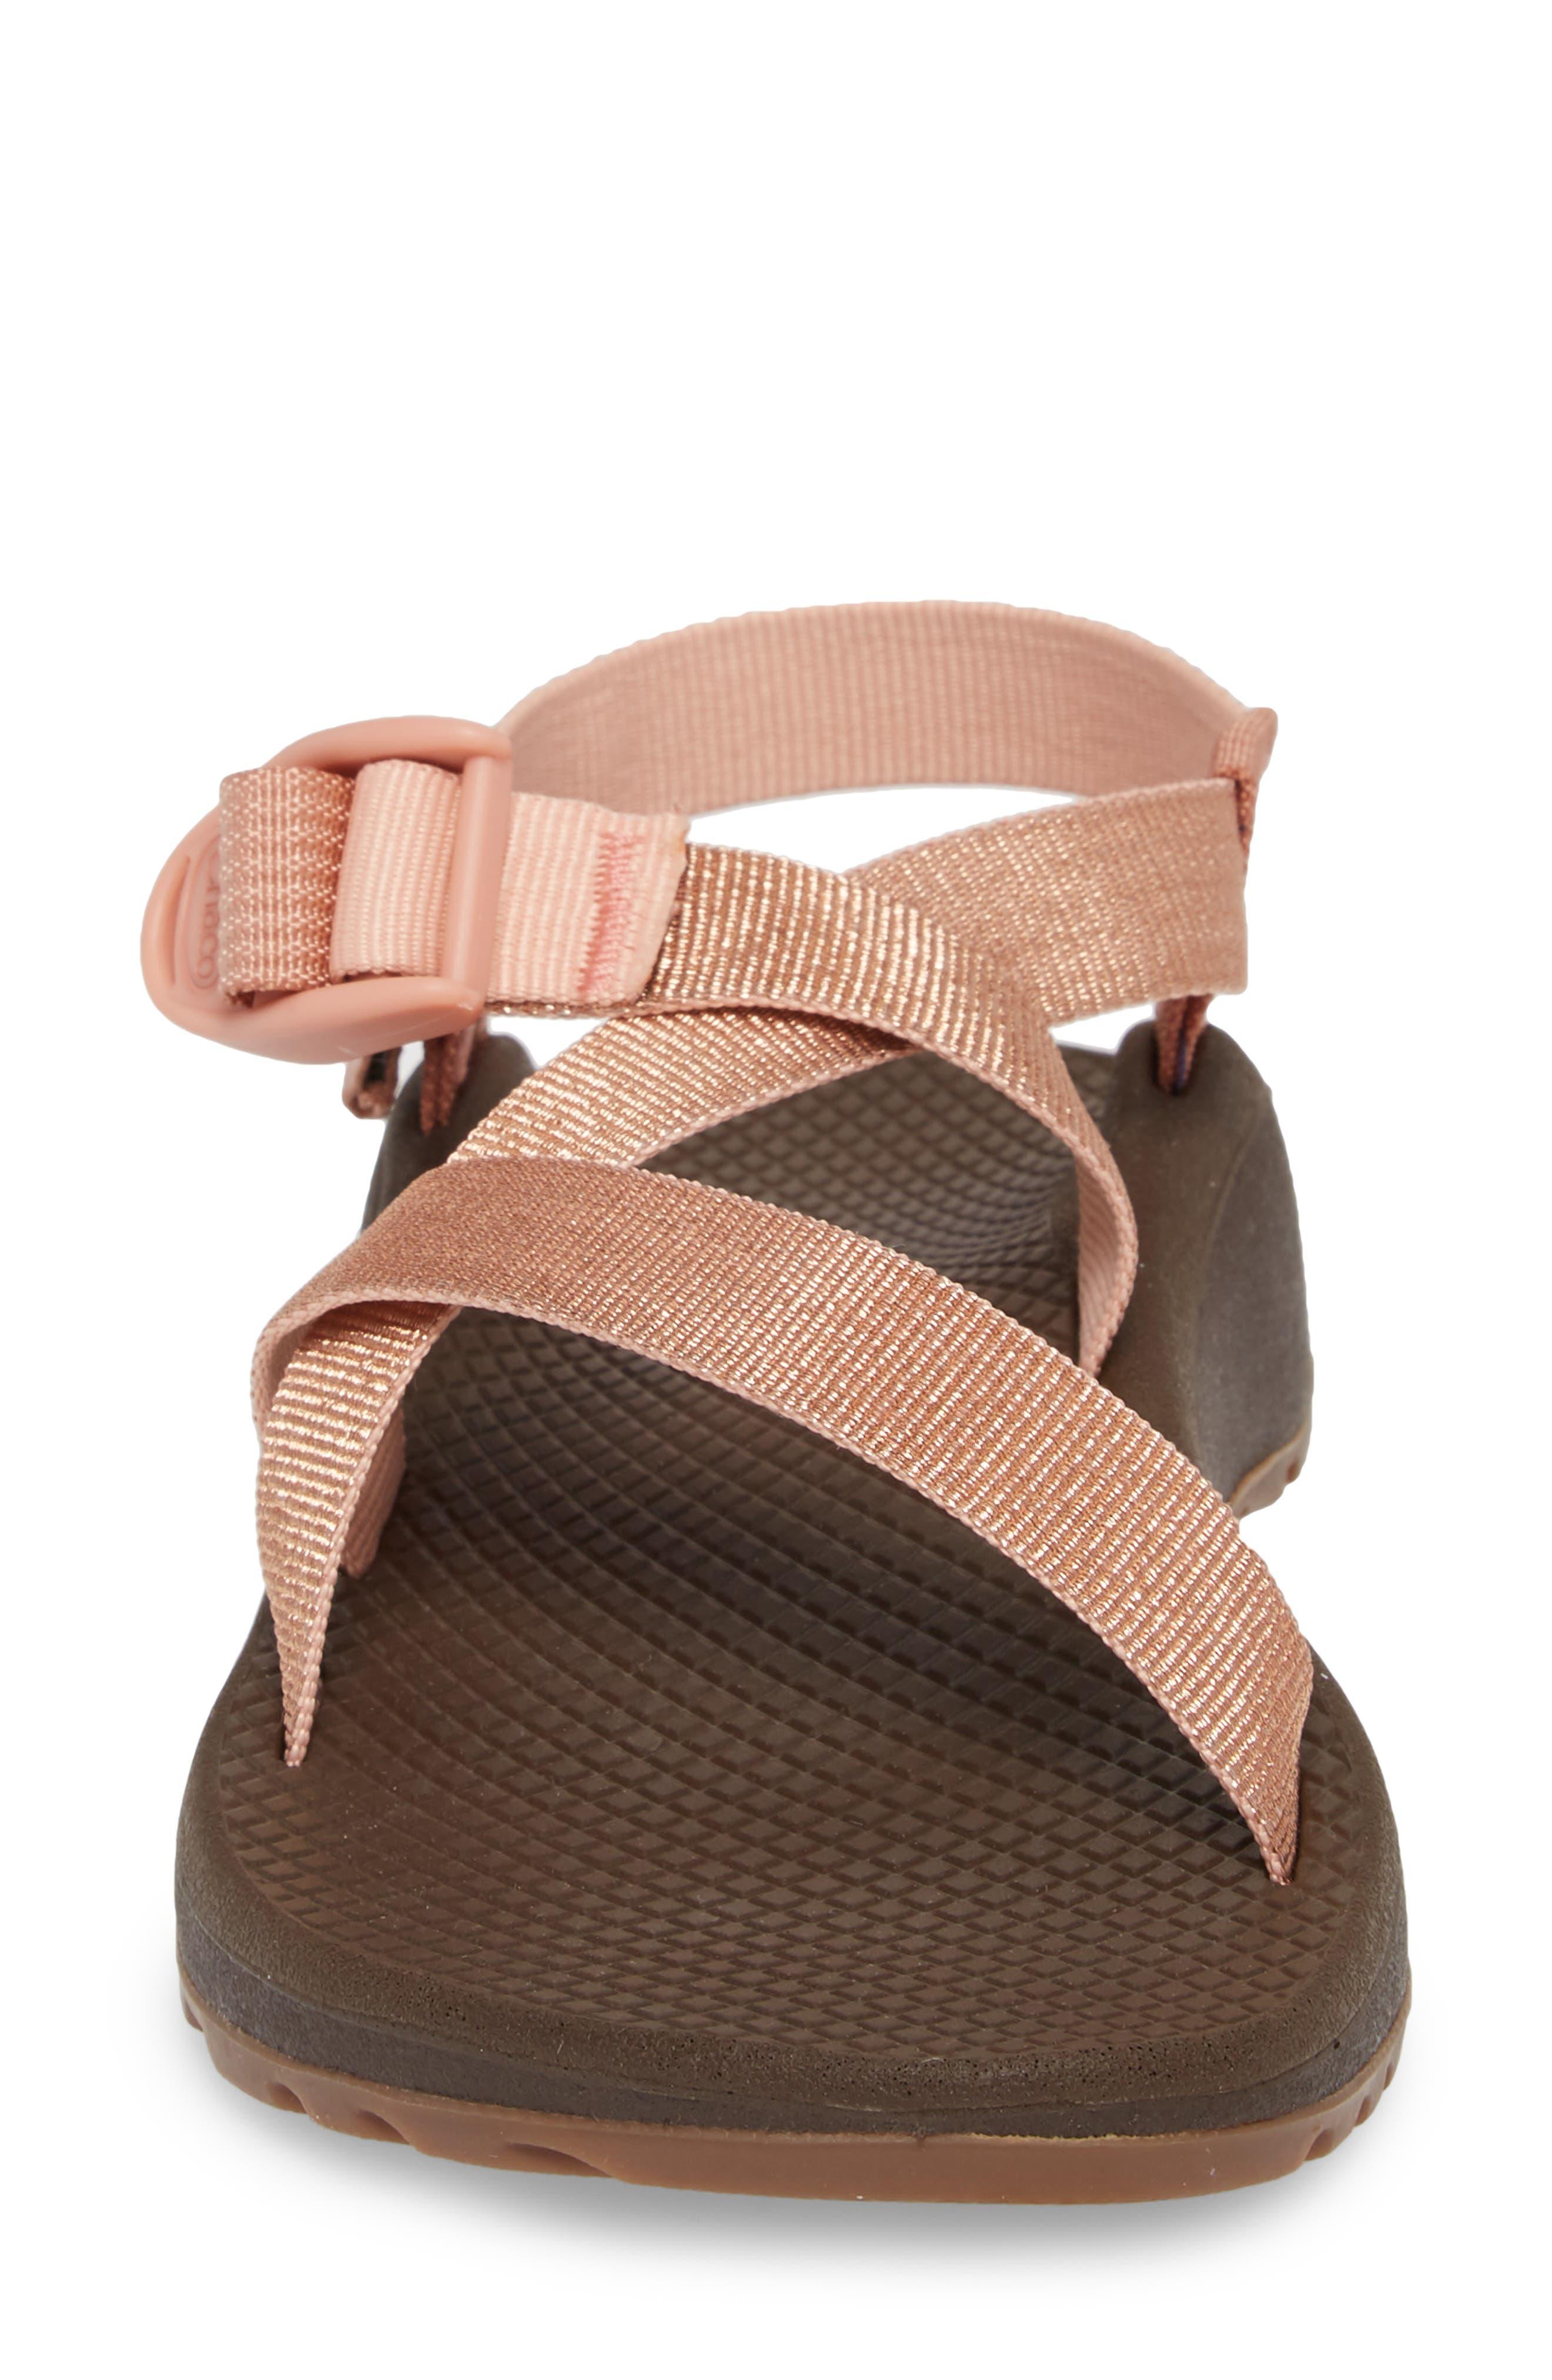 Z/Cloud Sandal,                             Alternate thumbnail 4, color,                             Metallic Rose Leather